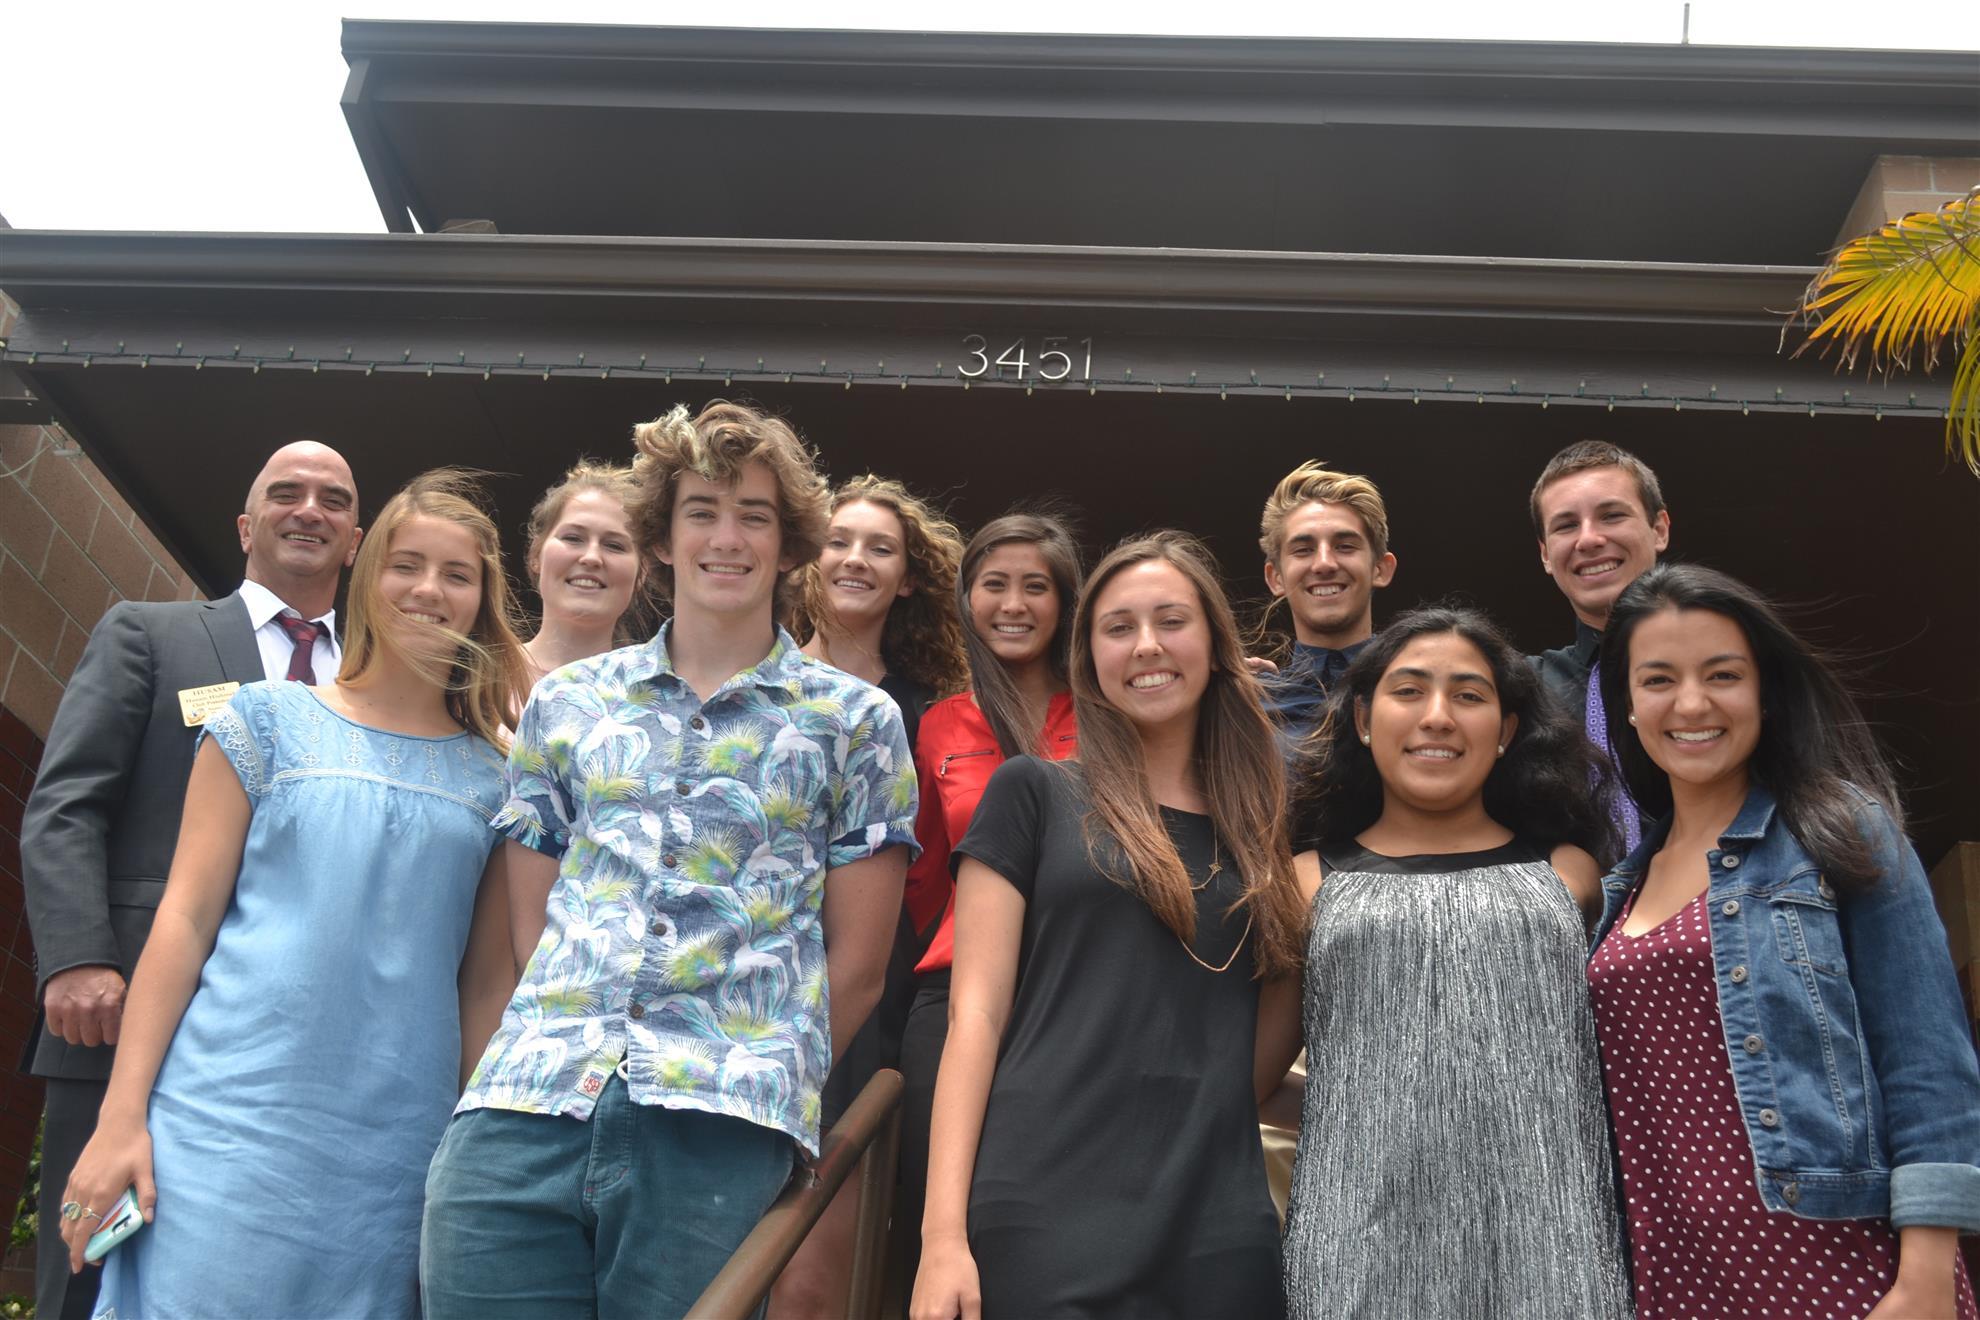 Stories | Rotary Club of Ventura East